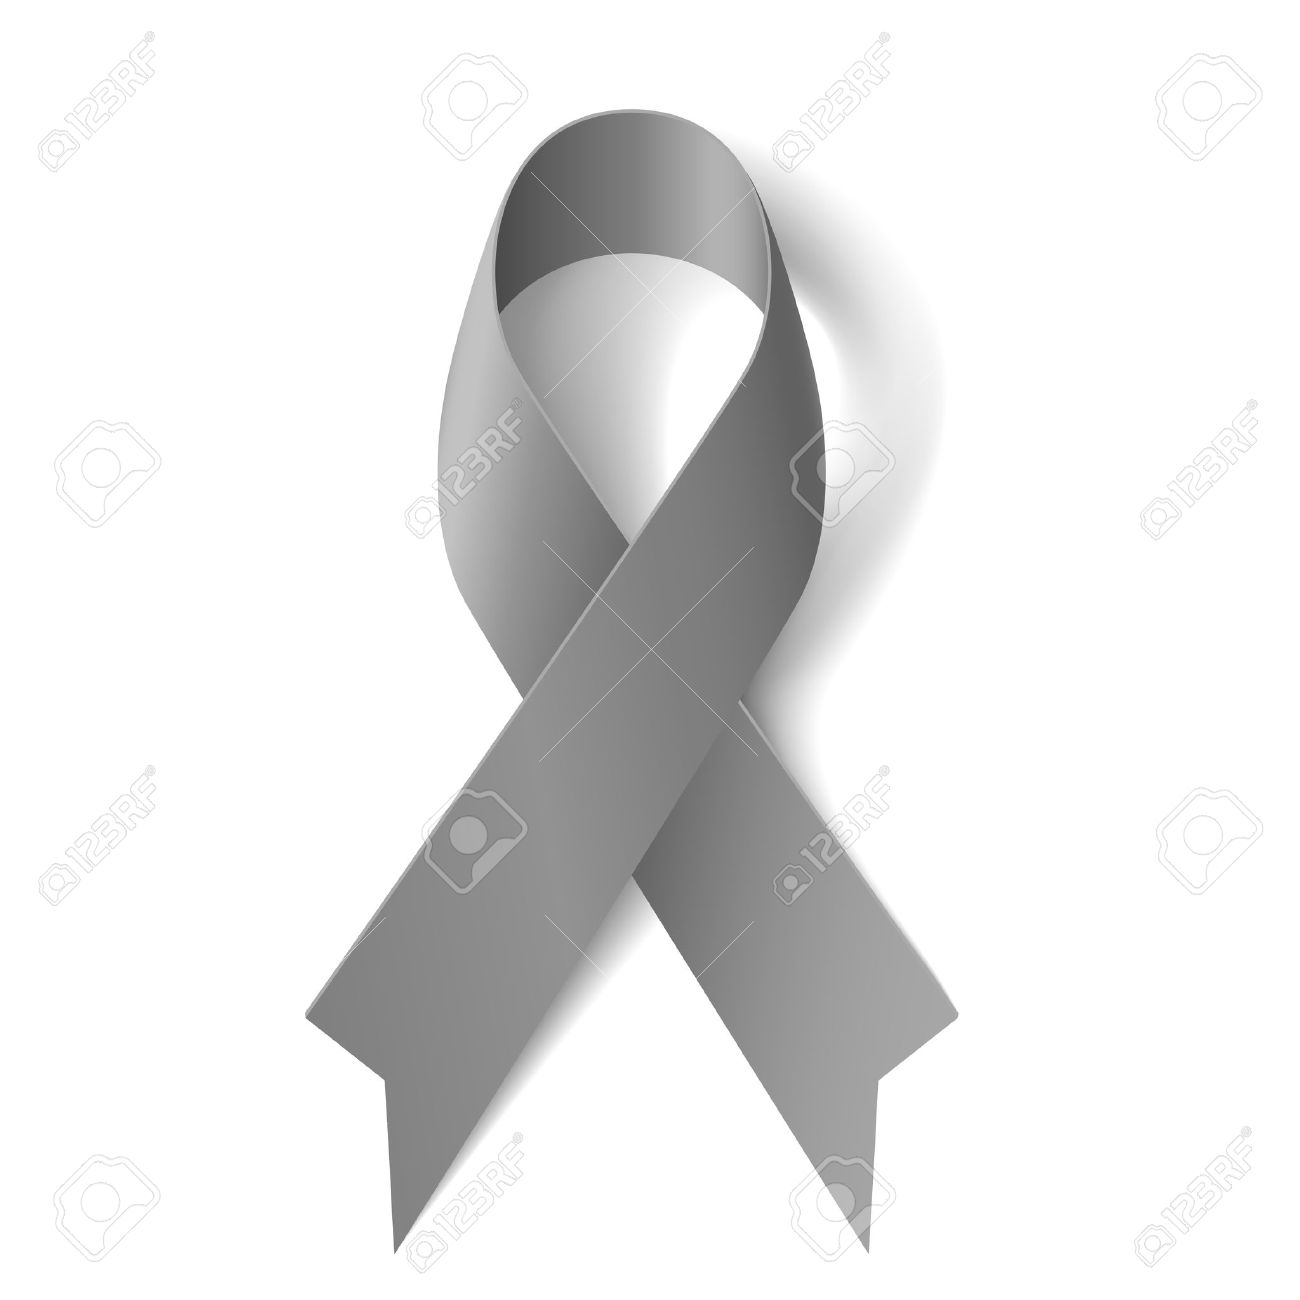 dress - Cancer Brain symbol video